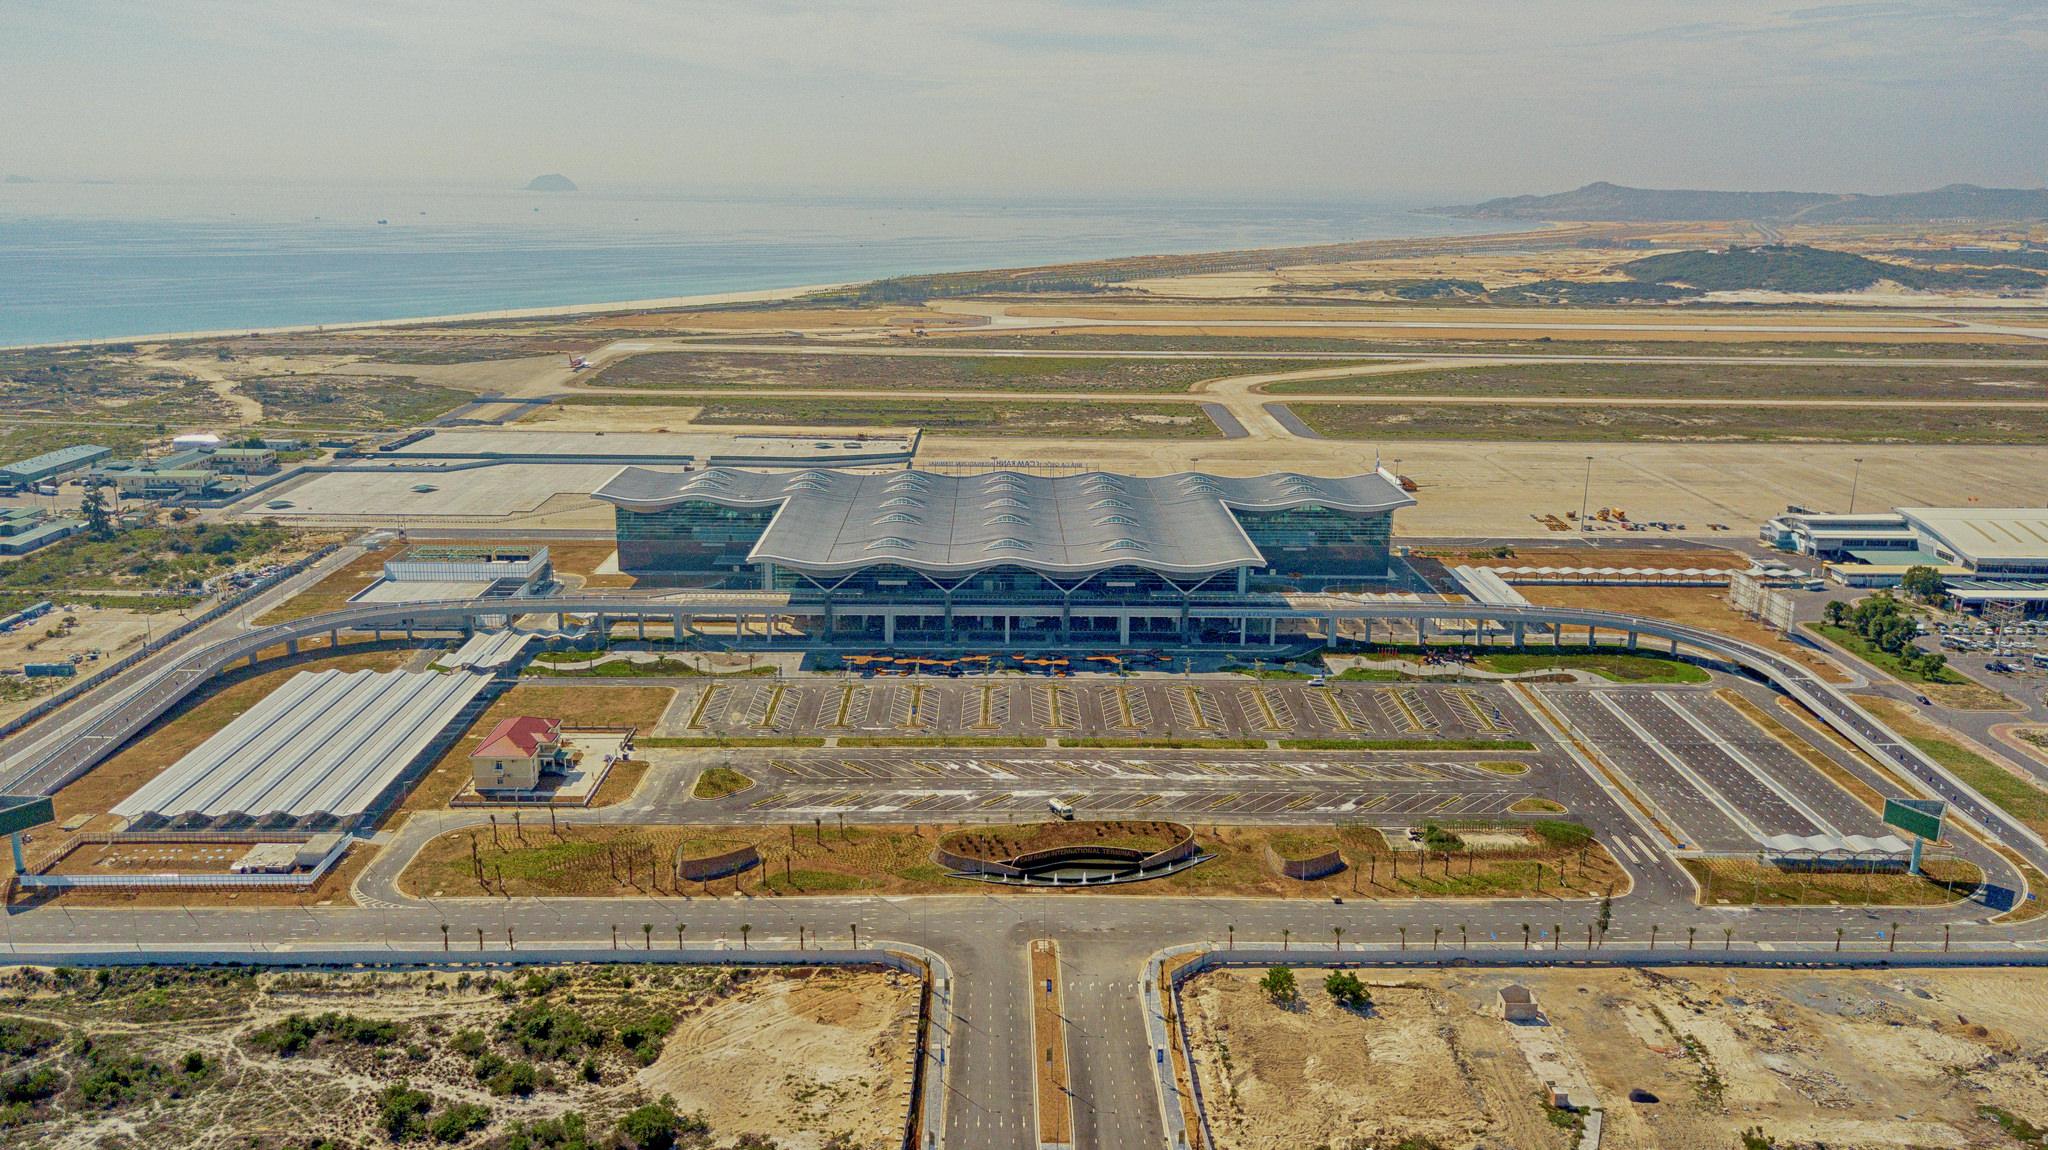 20180626 - Cam Ranh Airport - Architecture - Flycam - 0015.jpg